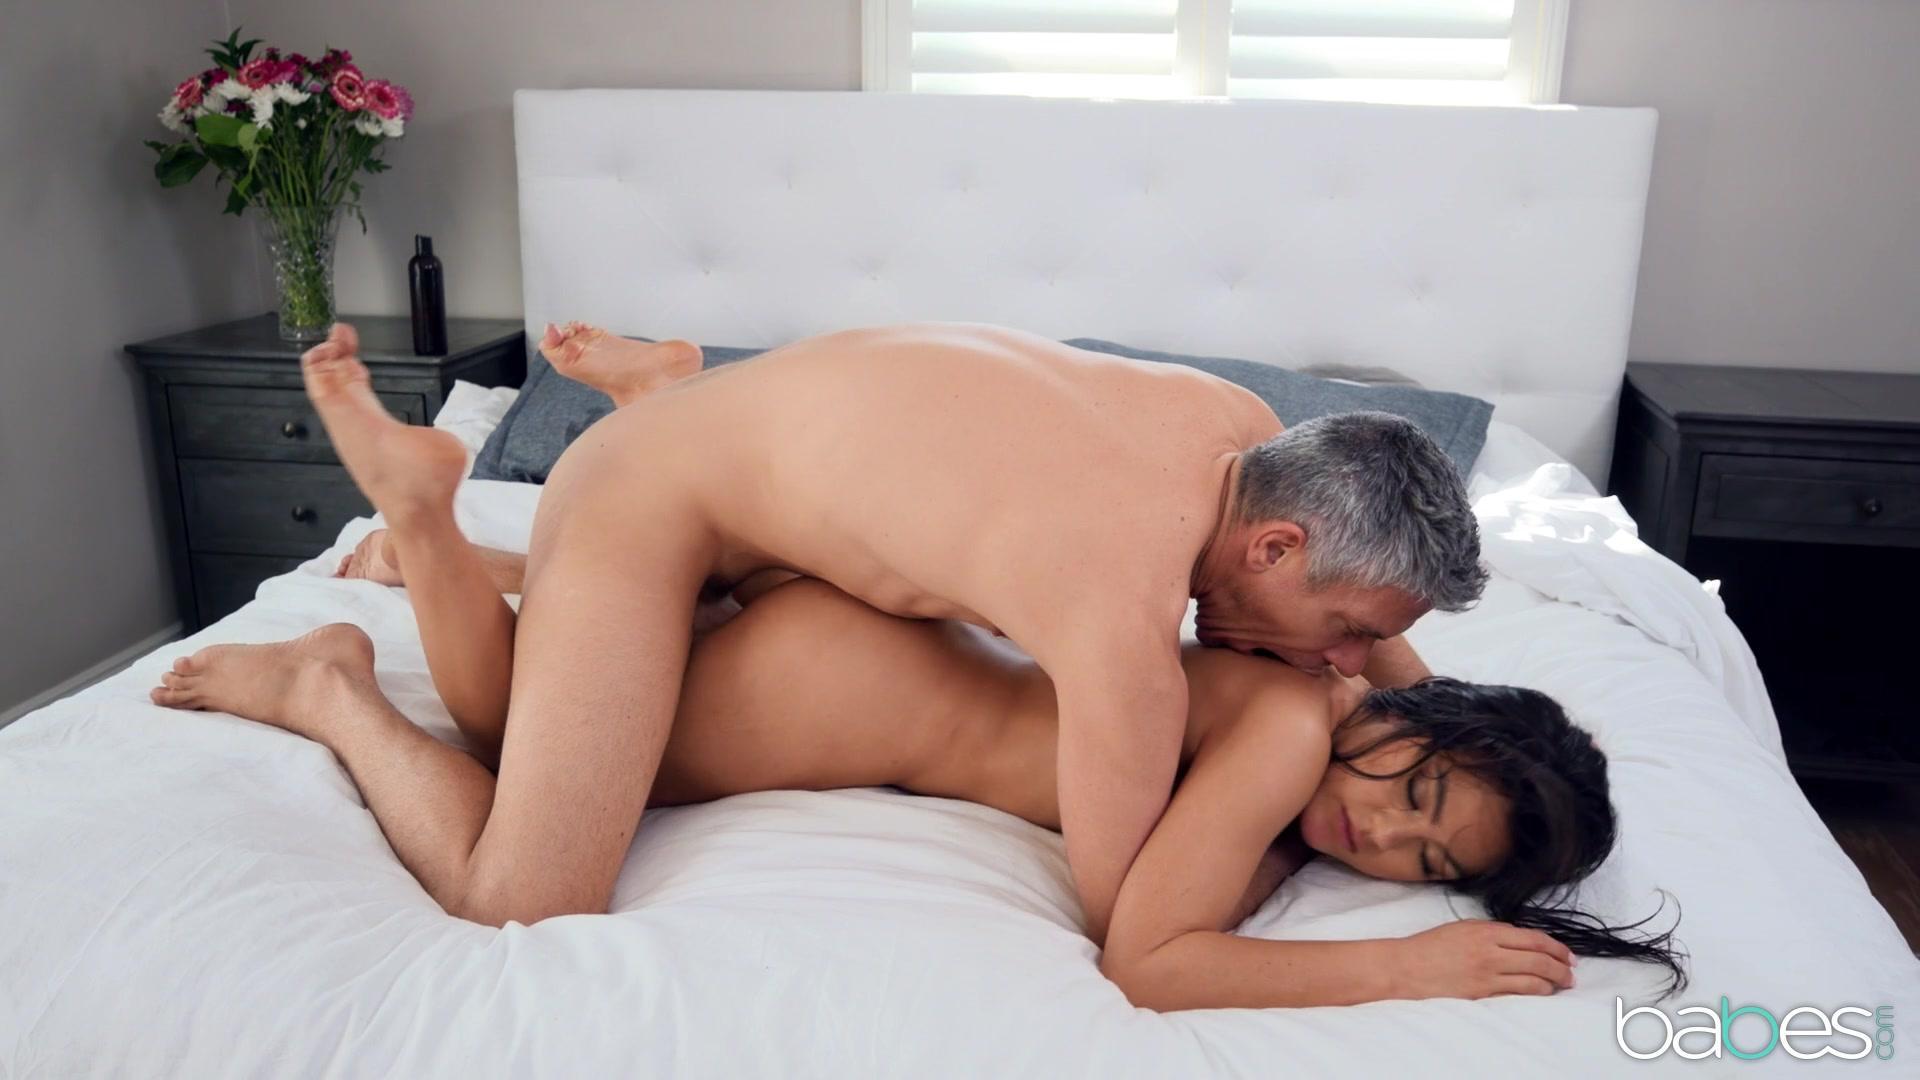 Babes – Kendra Spade Partner Massage